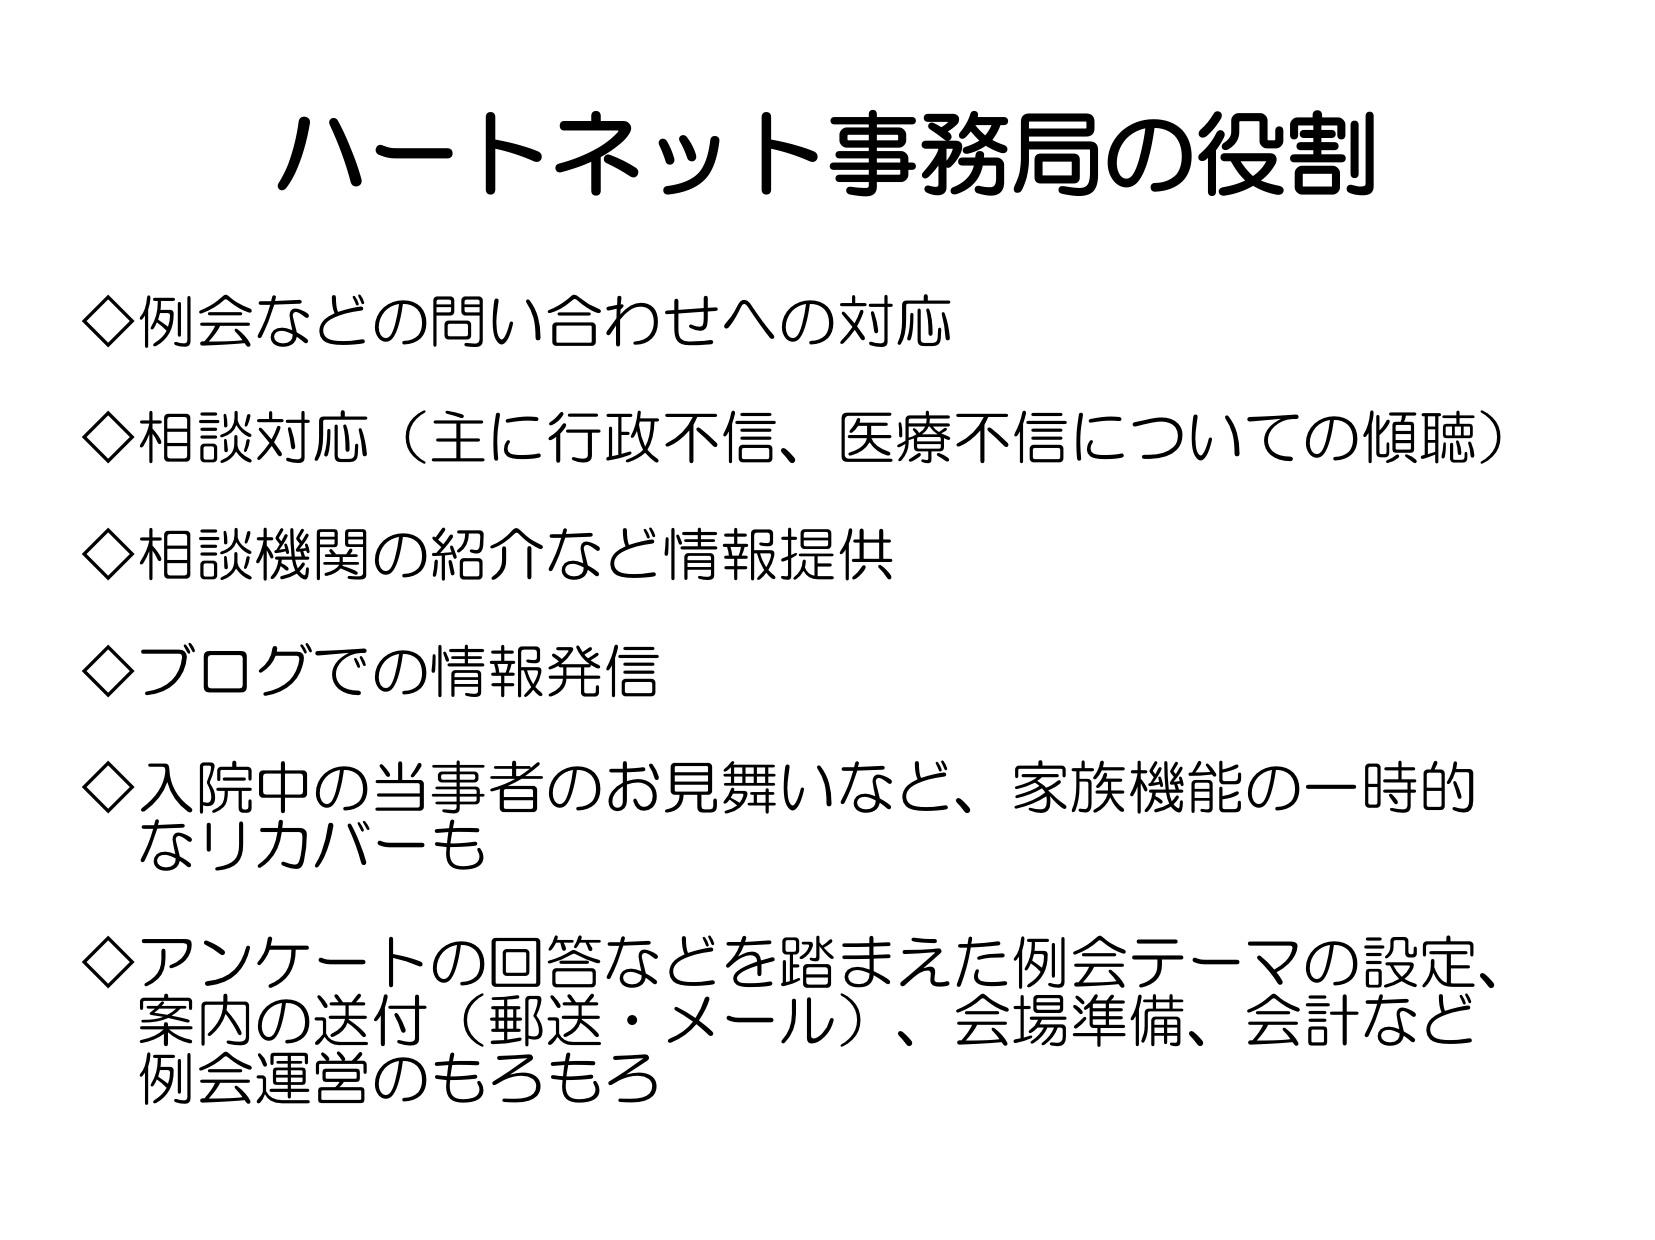 PS養成講座…パワーポイント資料②_a0103650_20415732.jpg